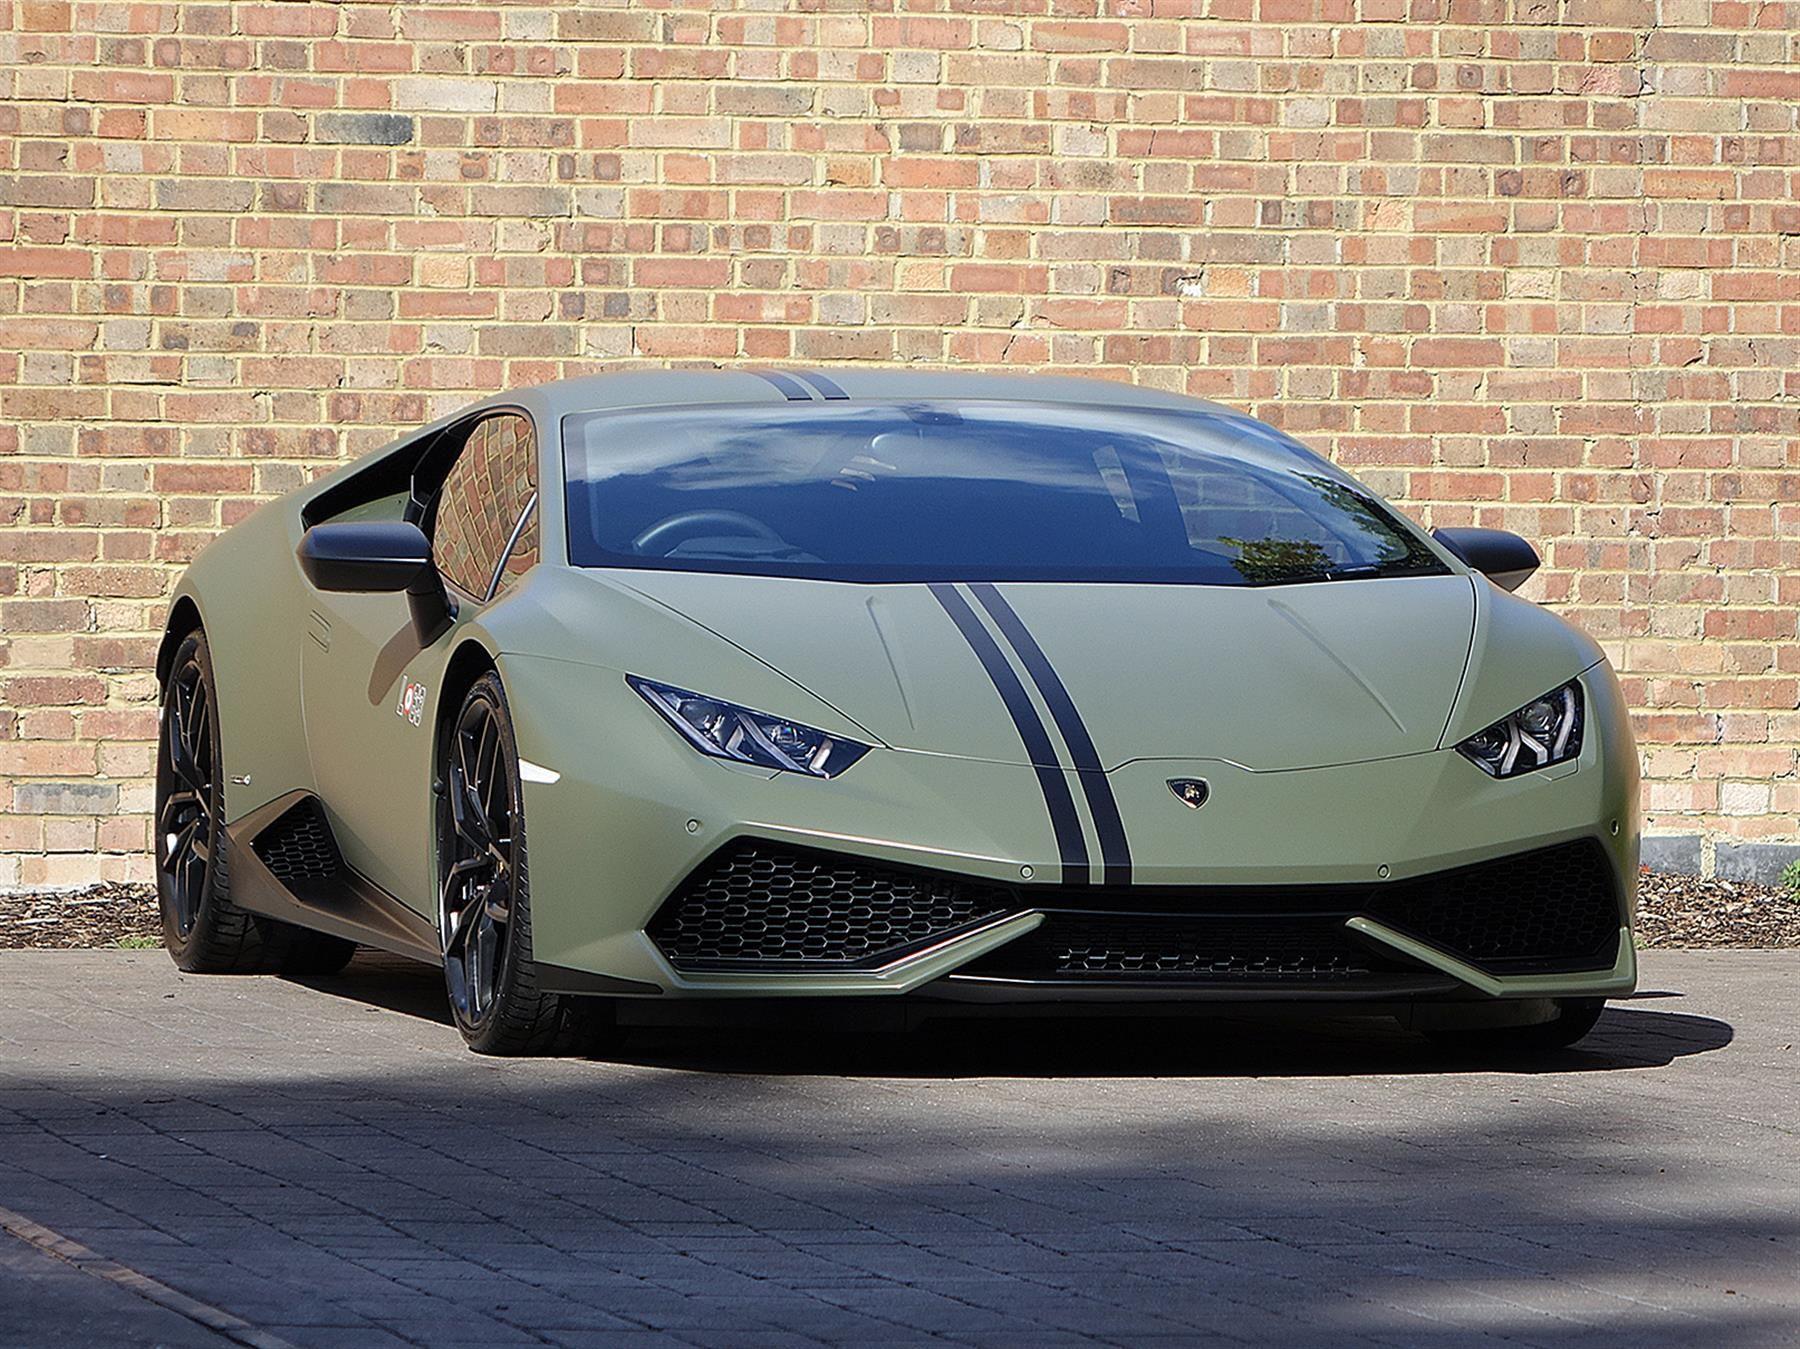 Huracan Superleggera Spy Shots Update Pistonheads Lamborghini Huracan Lamborghini Lamborghini Roadster